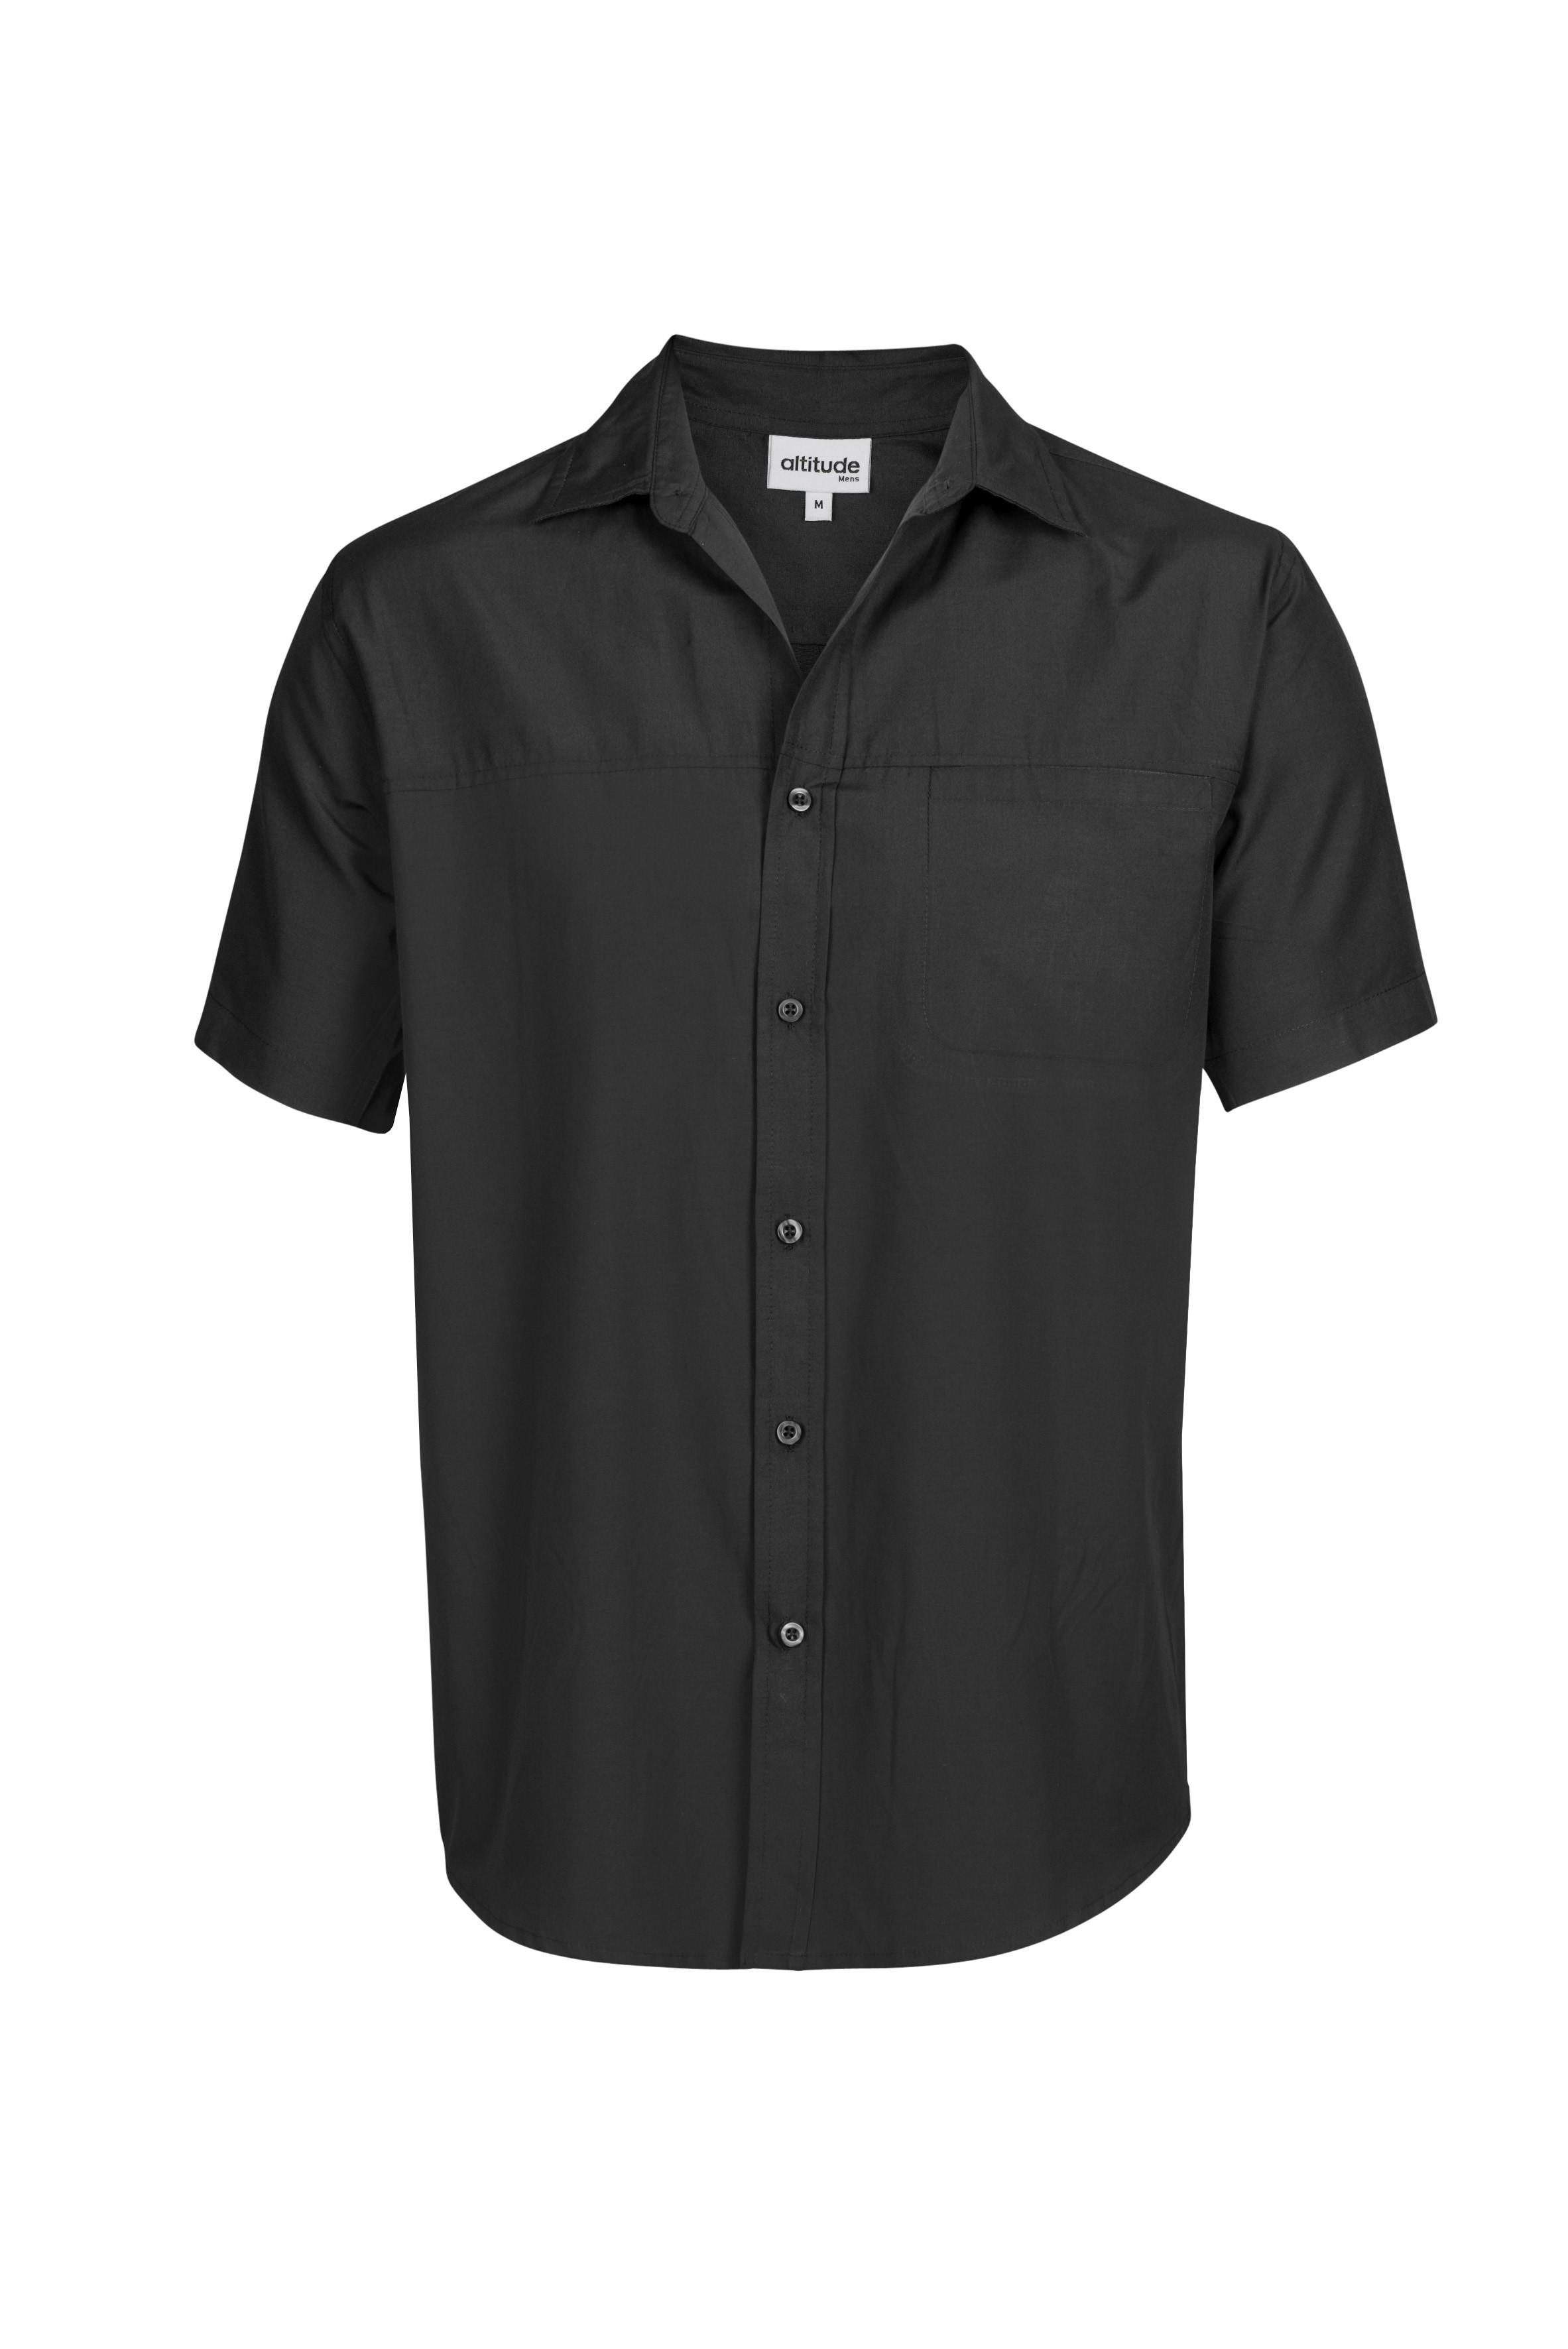 Mens Short Sleeve Empire Shirt